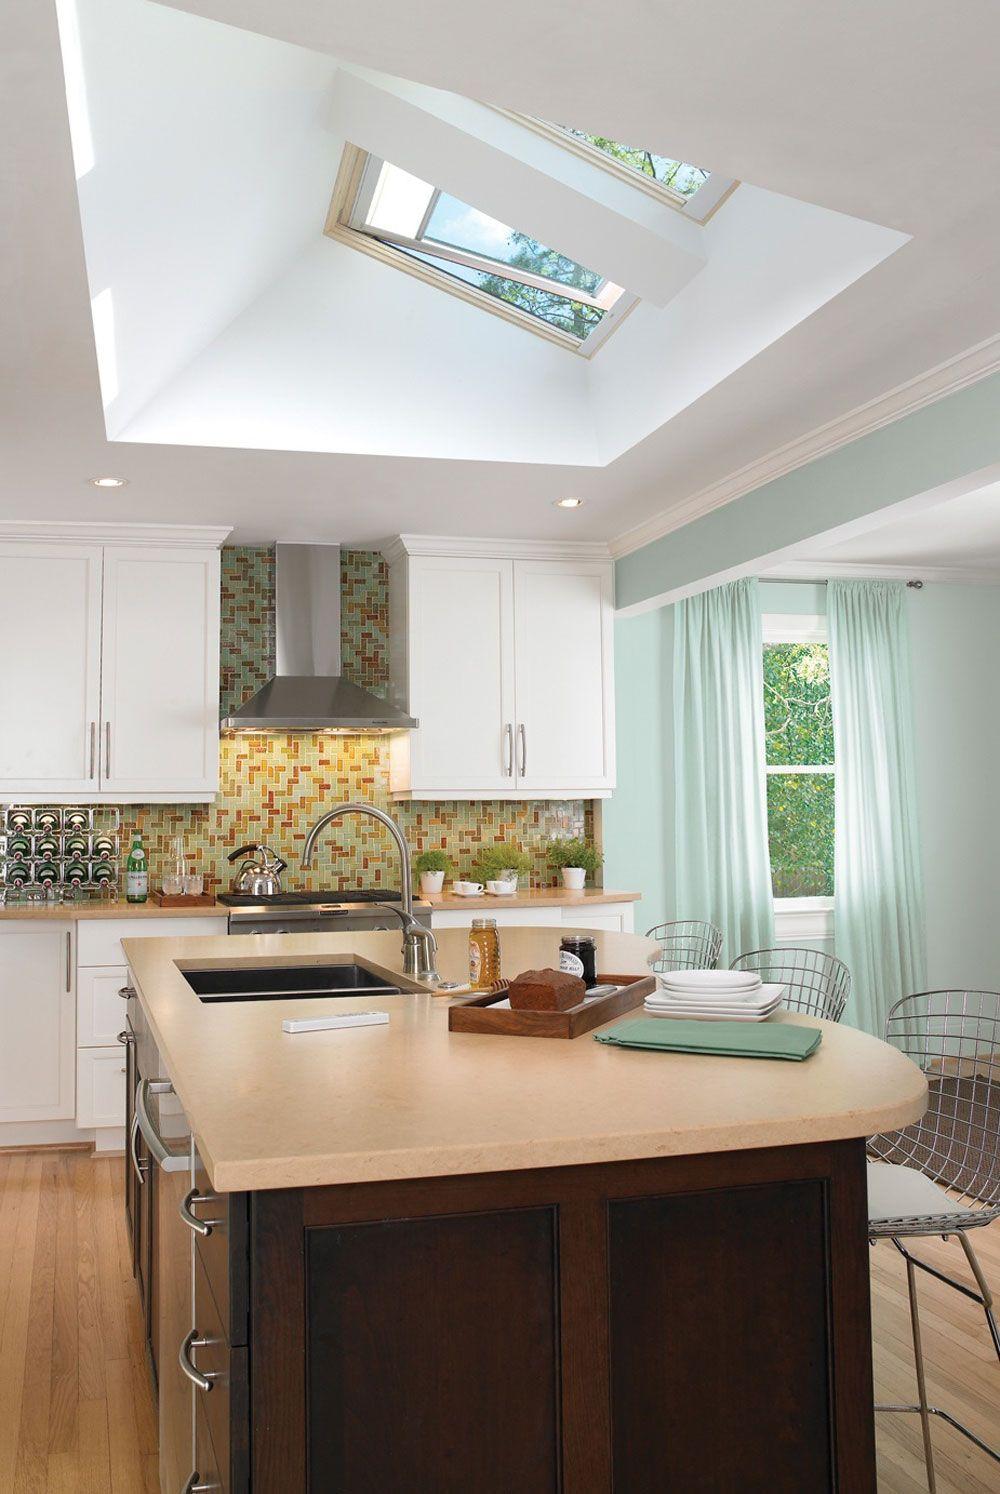 Charmant Kitchen Skylights! Kitchens We Love At Design Connection, Inc. | Kansas  City Interior Design Http://www.DesignConnectionInc.com